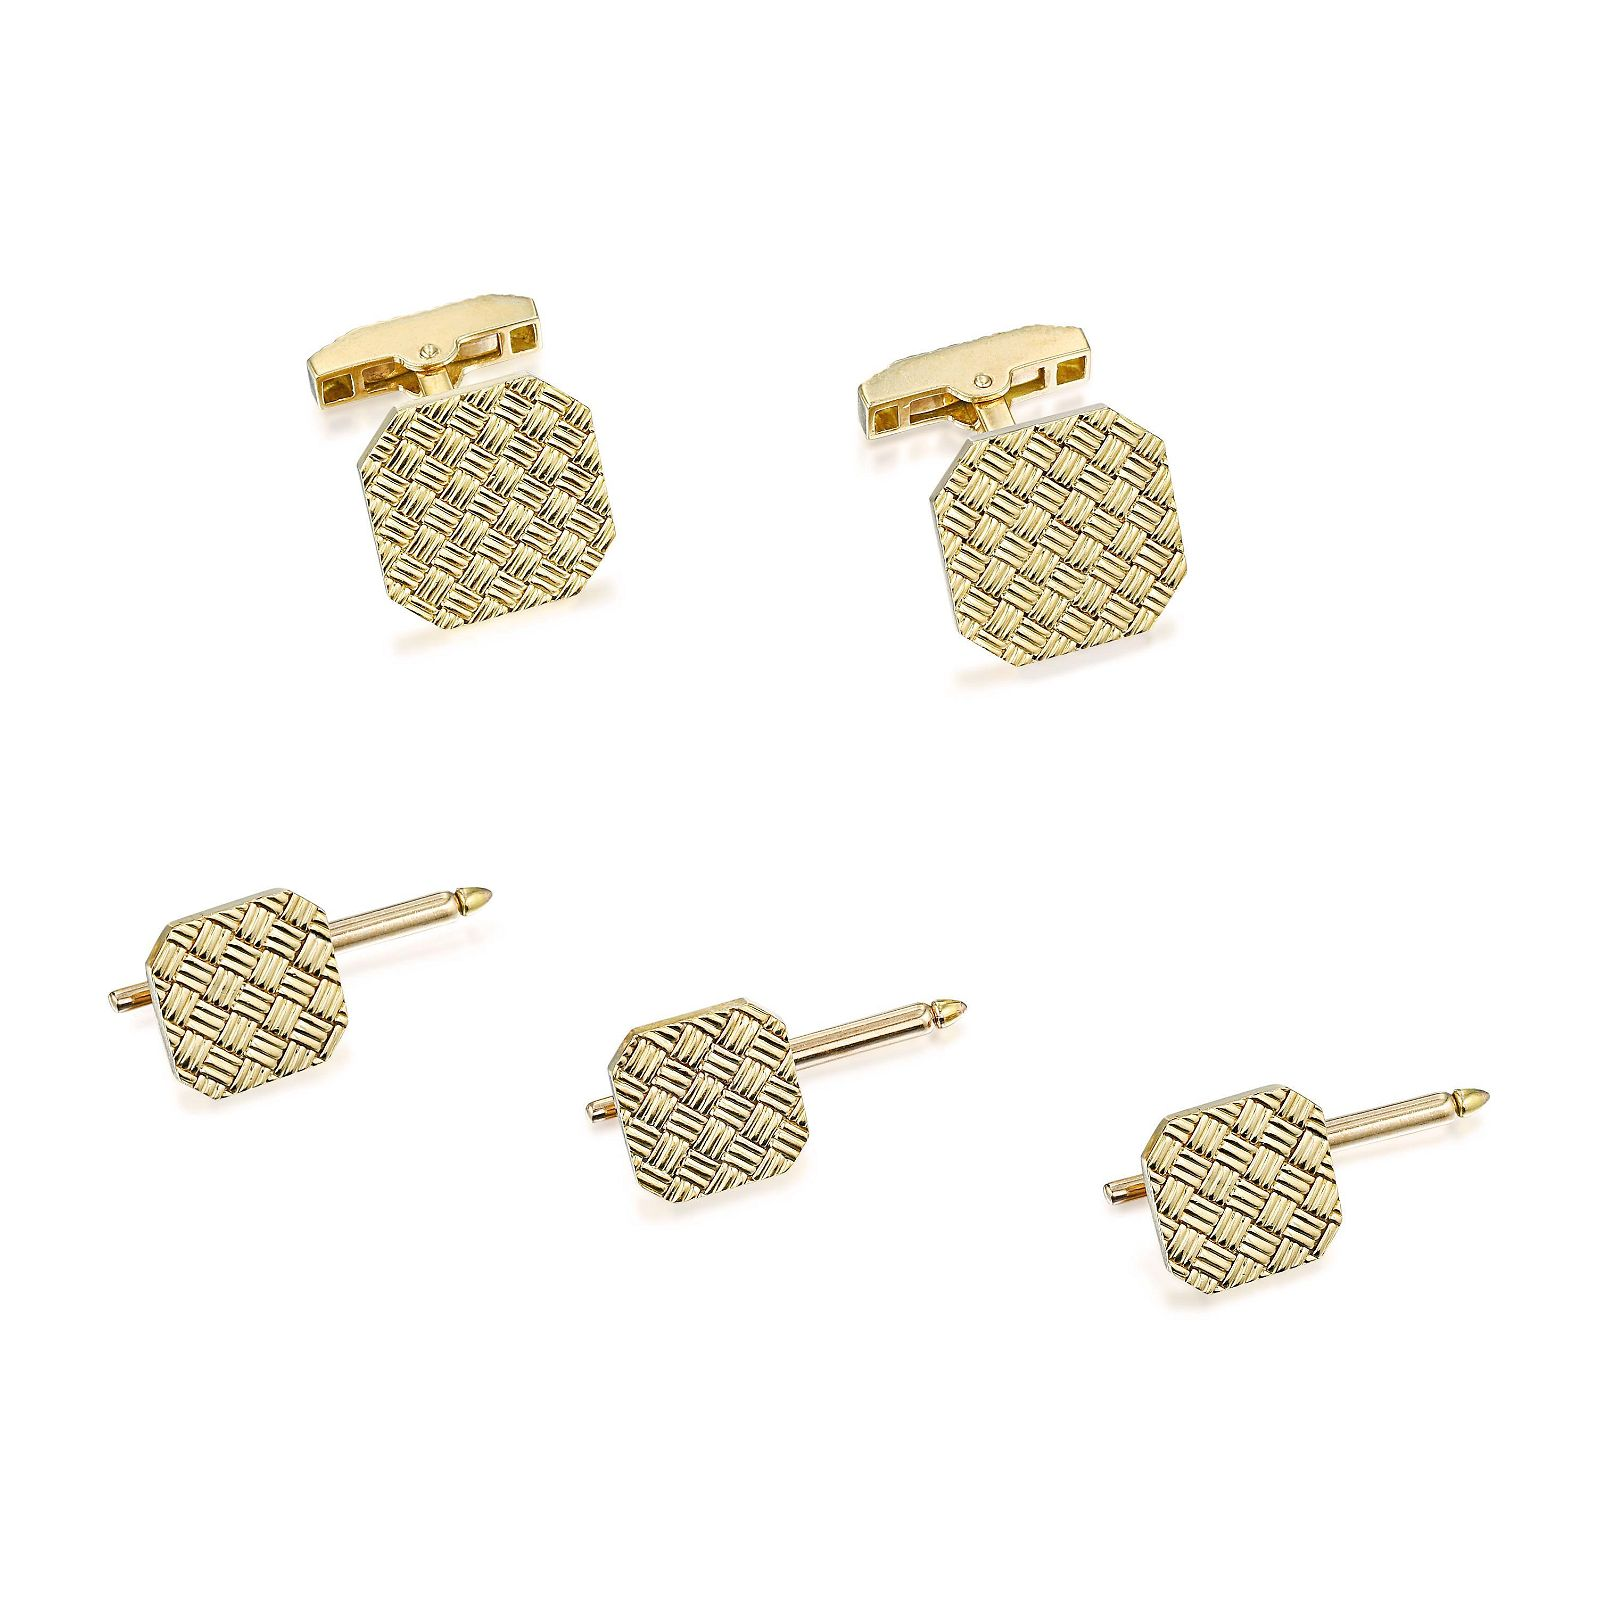 Tiffany & Co. Basket Weave Cufflink and Stud Set